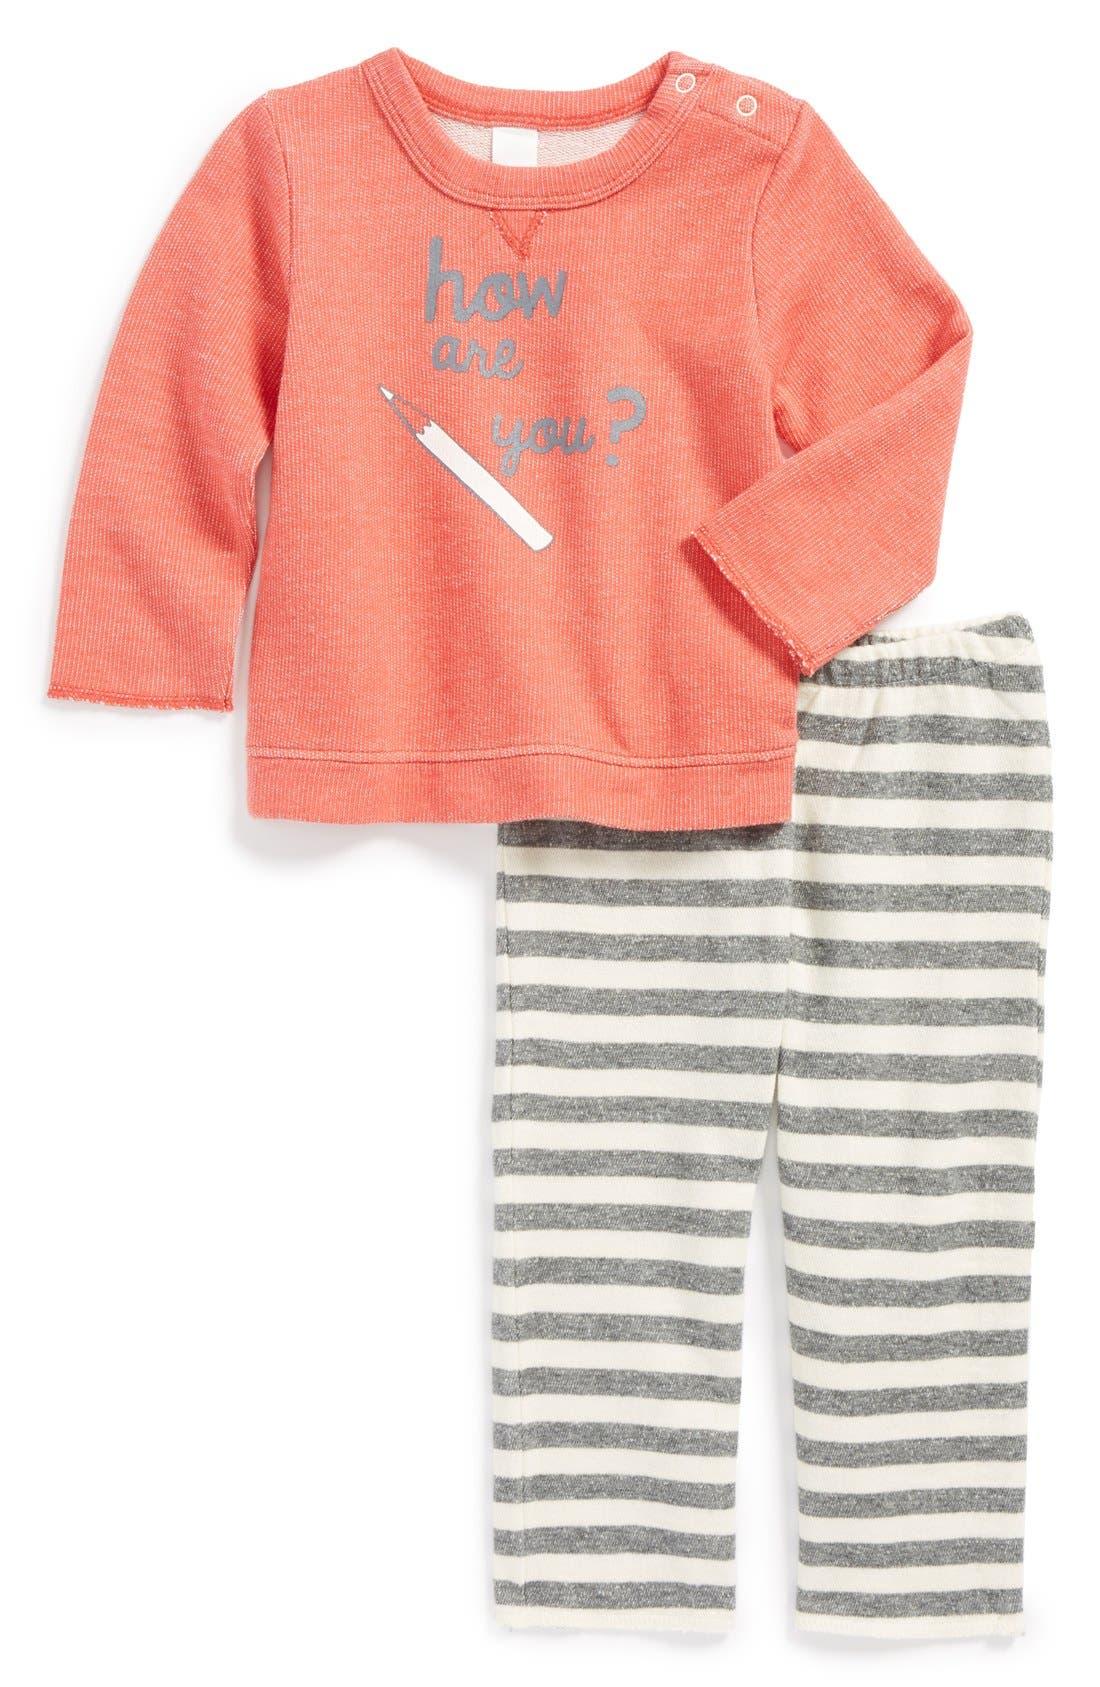 Main Image - Stem Baby 'How Are You?' Organic Cotton Sweatshirt & Pants (Baby)